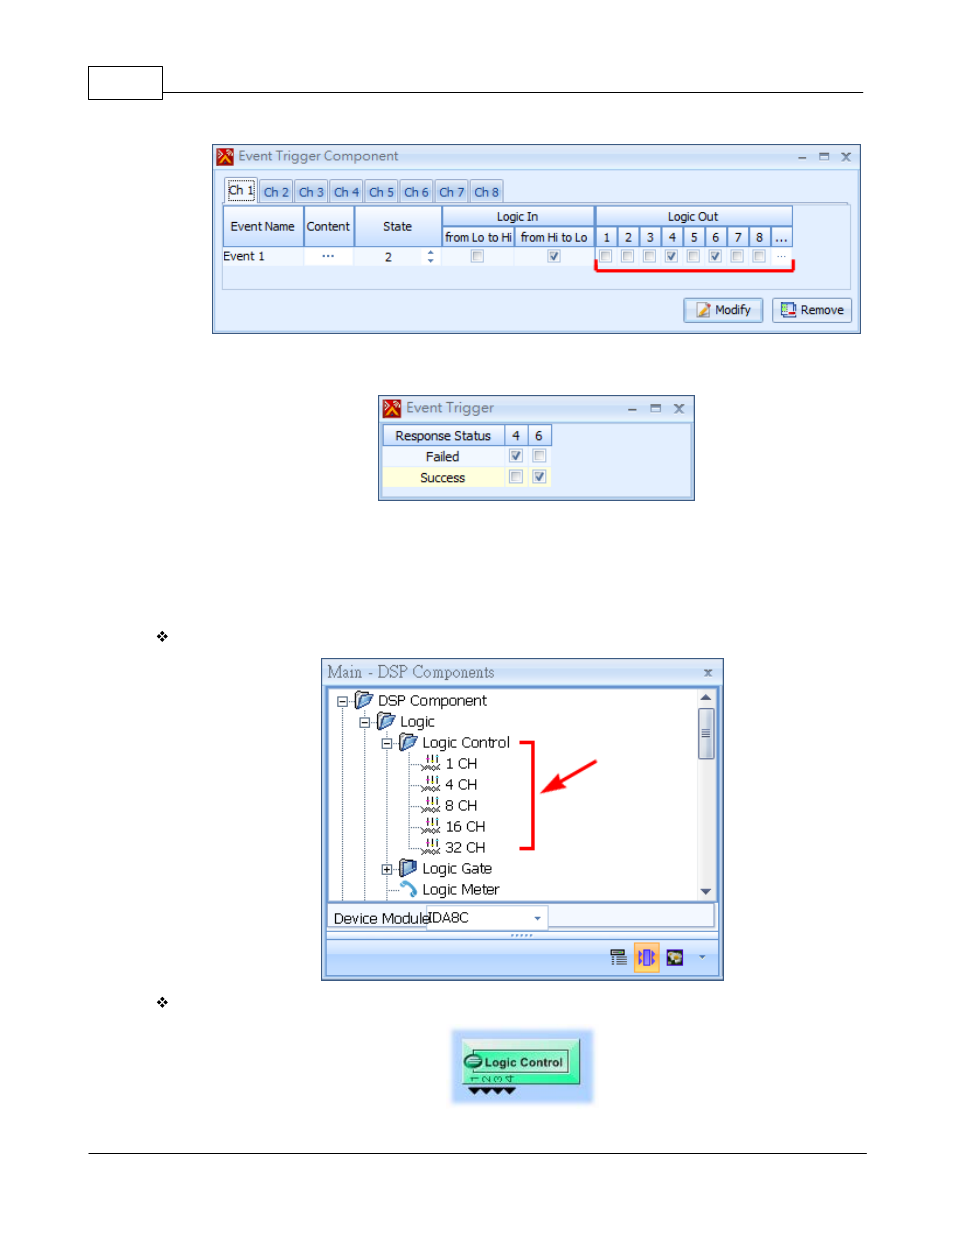 Logic control ateis ida8c user manual page 378 446 background image publicscrutiny Choice Image